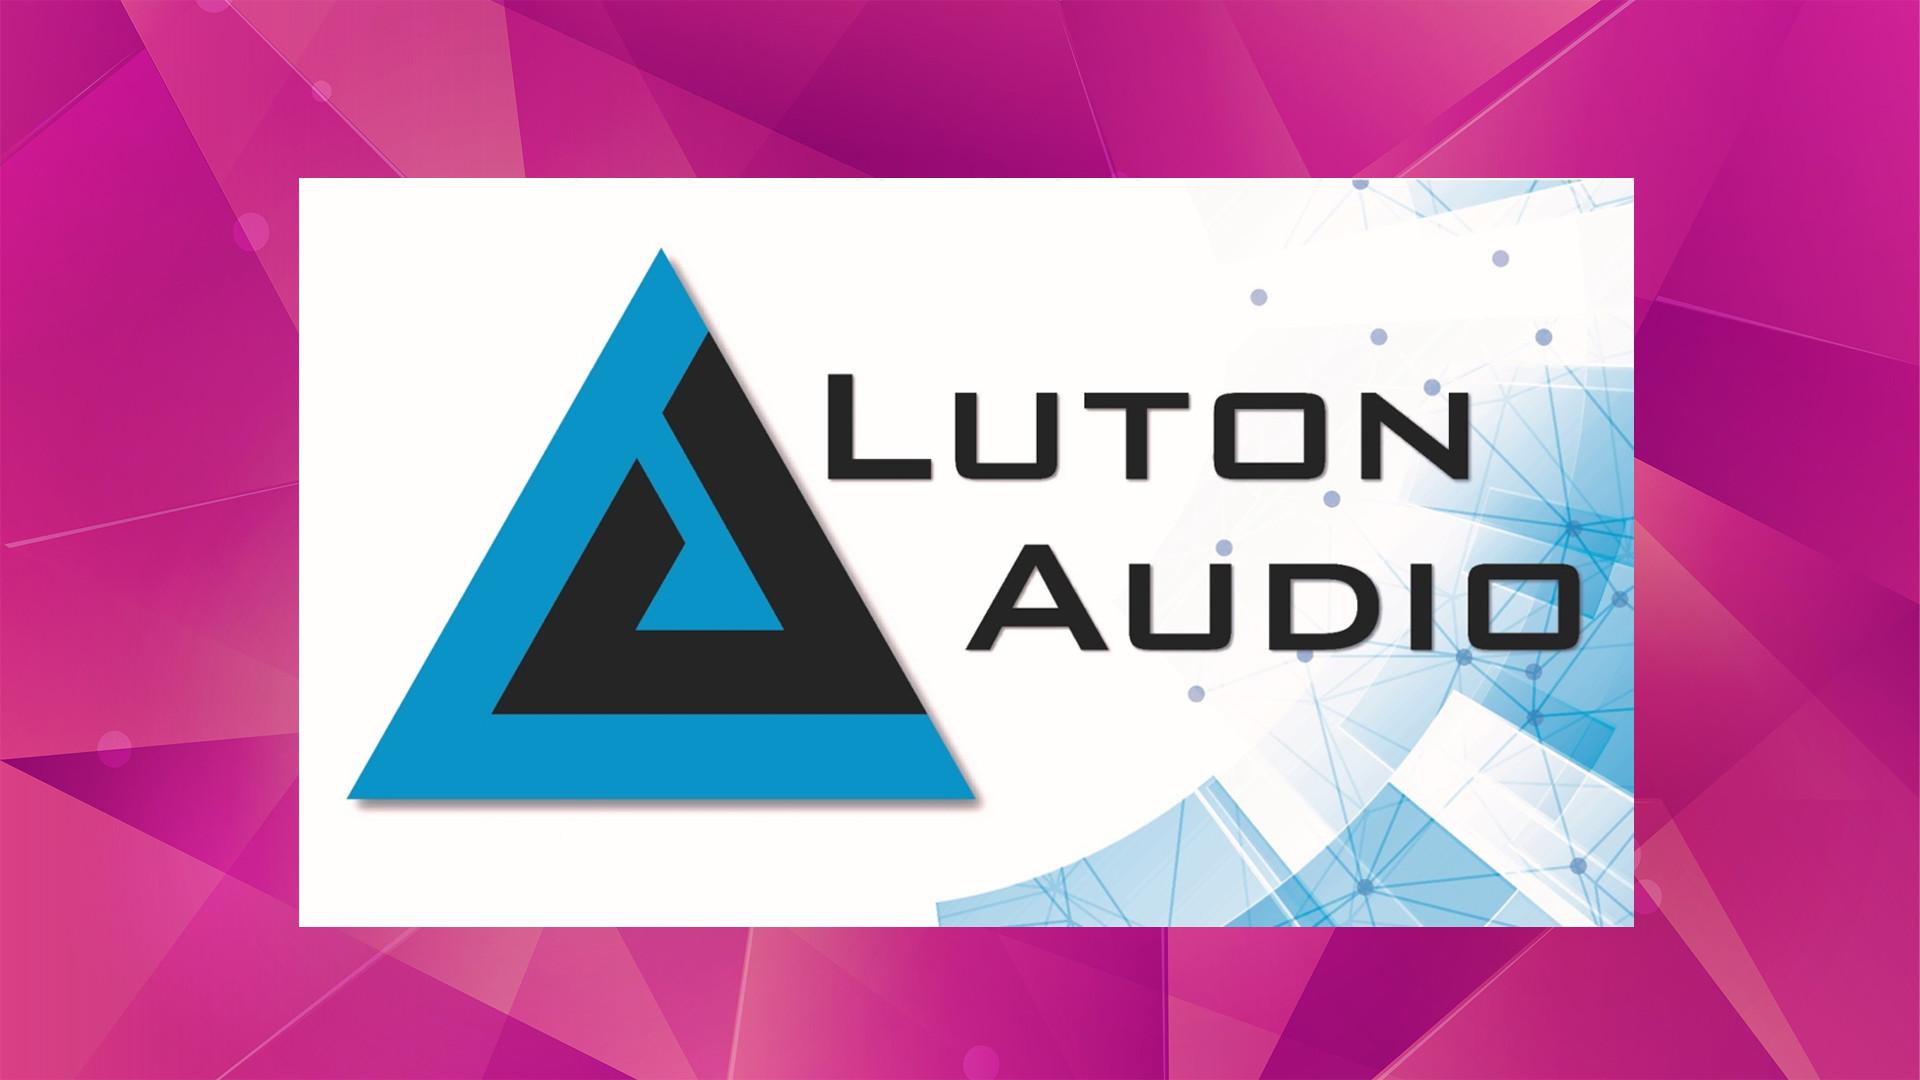 Luton audio